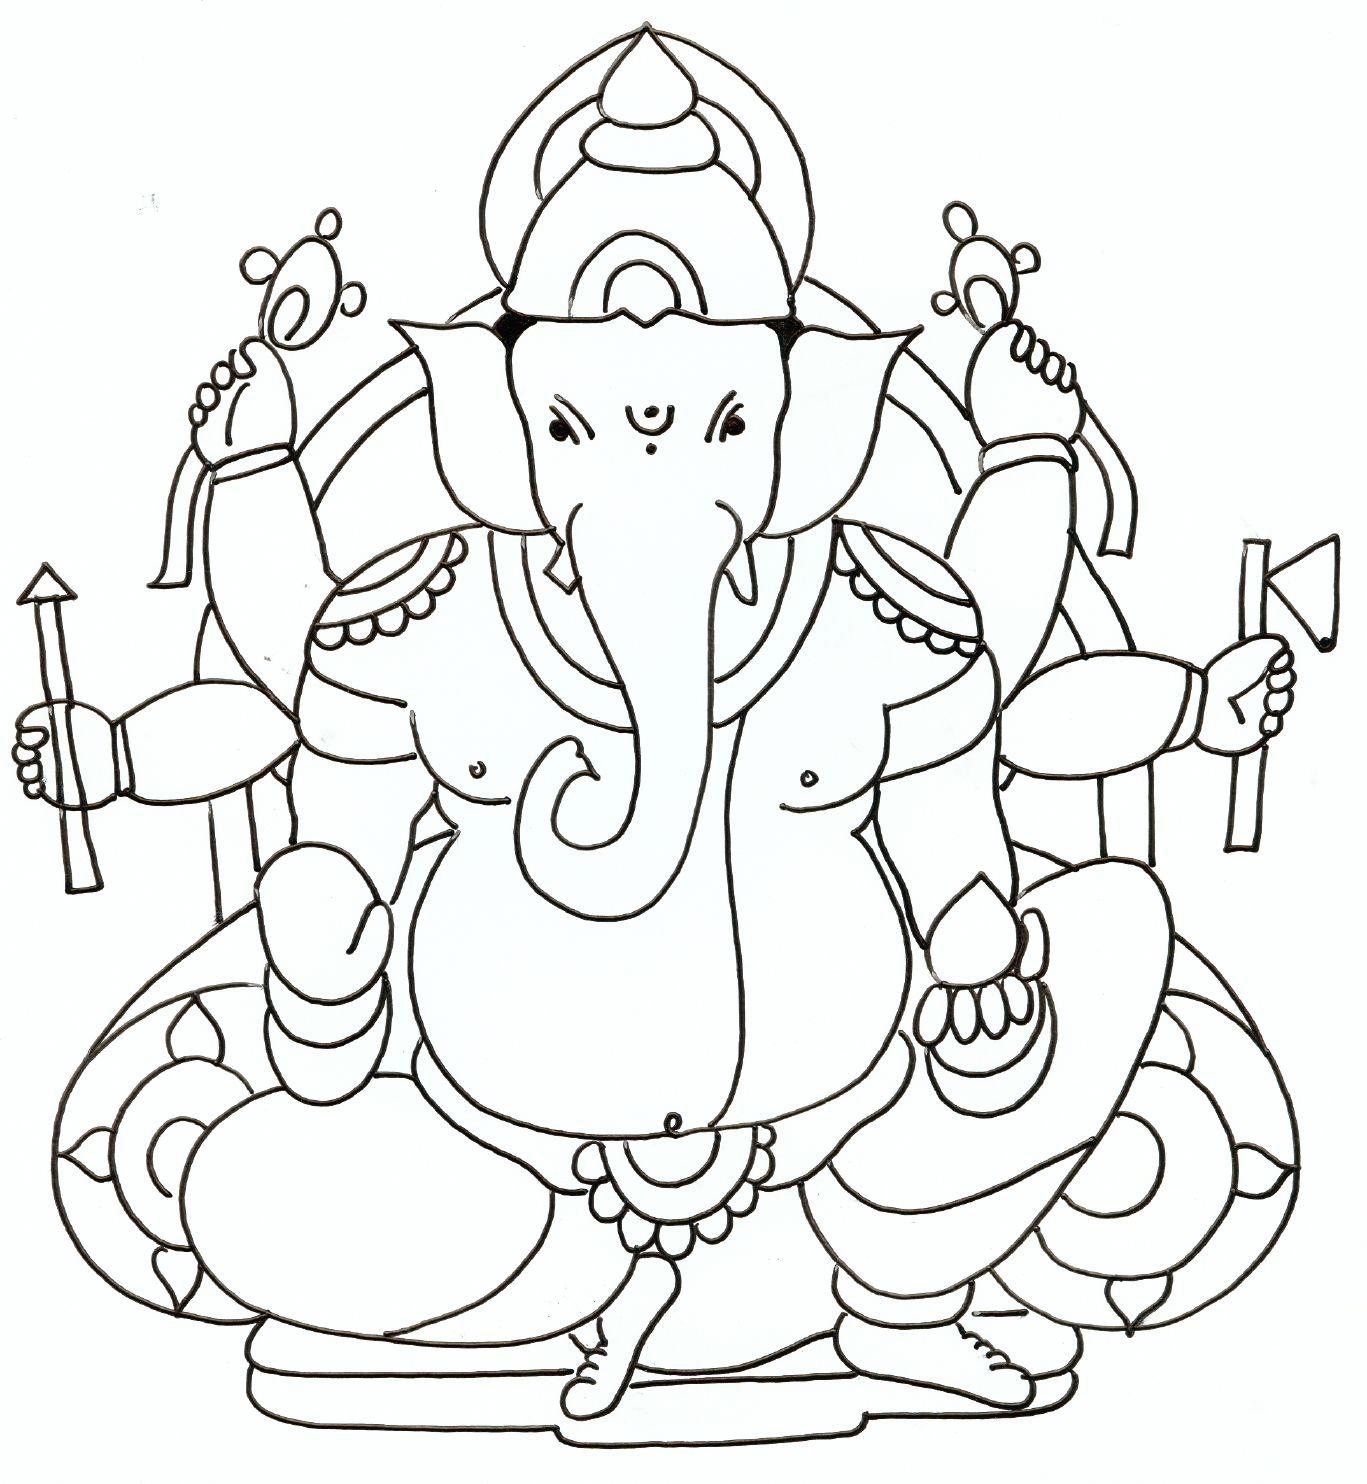 Ganesh Drawings For Kids